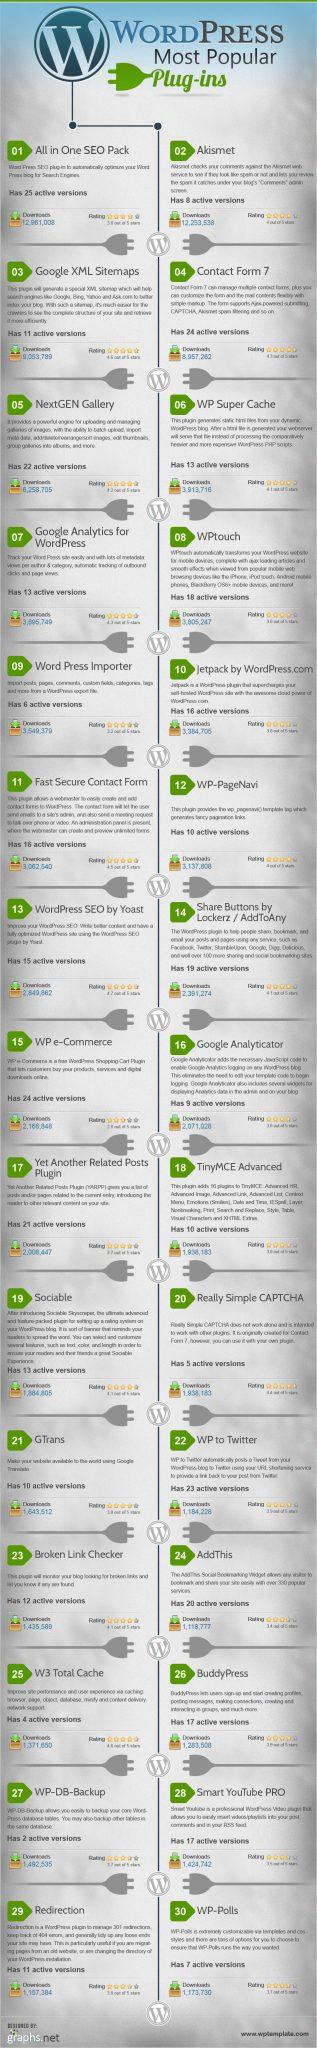 The Top 30 Most Popular WordPress Plugins (Infographic)